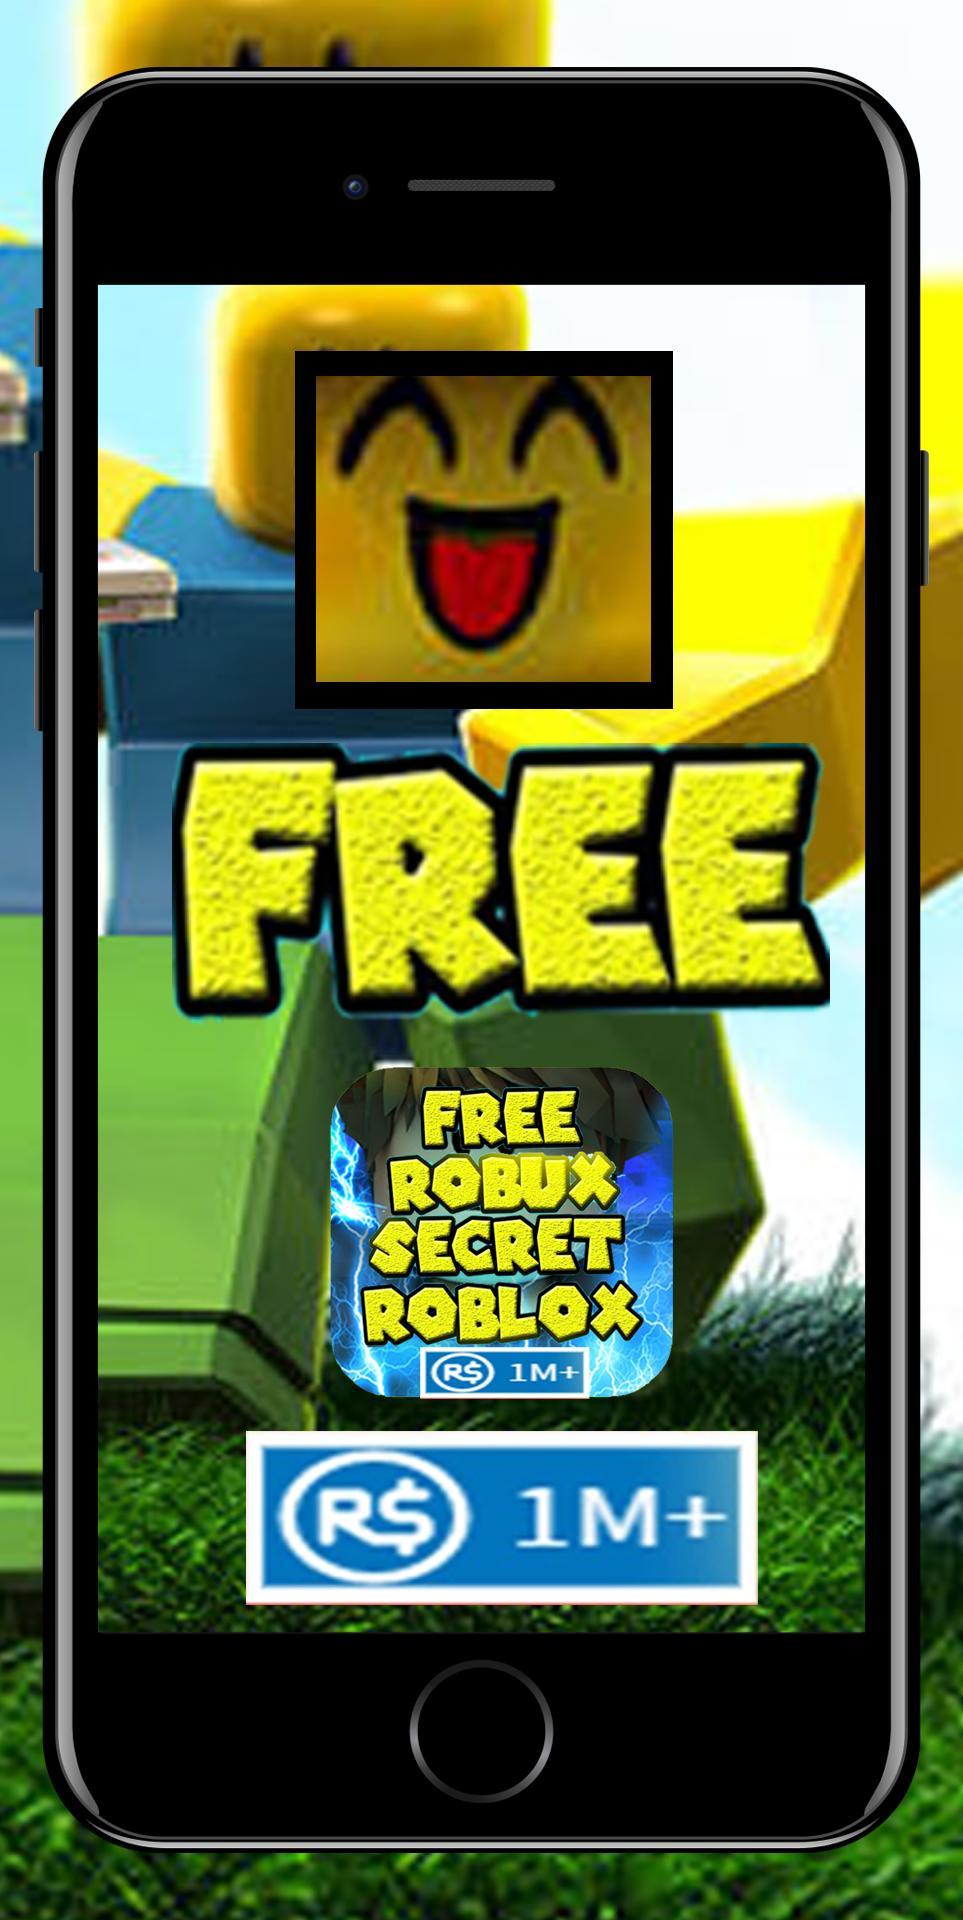 robux roblox tix prank unlimited app apkpure screen upgrade internet fast using